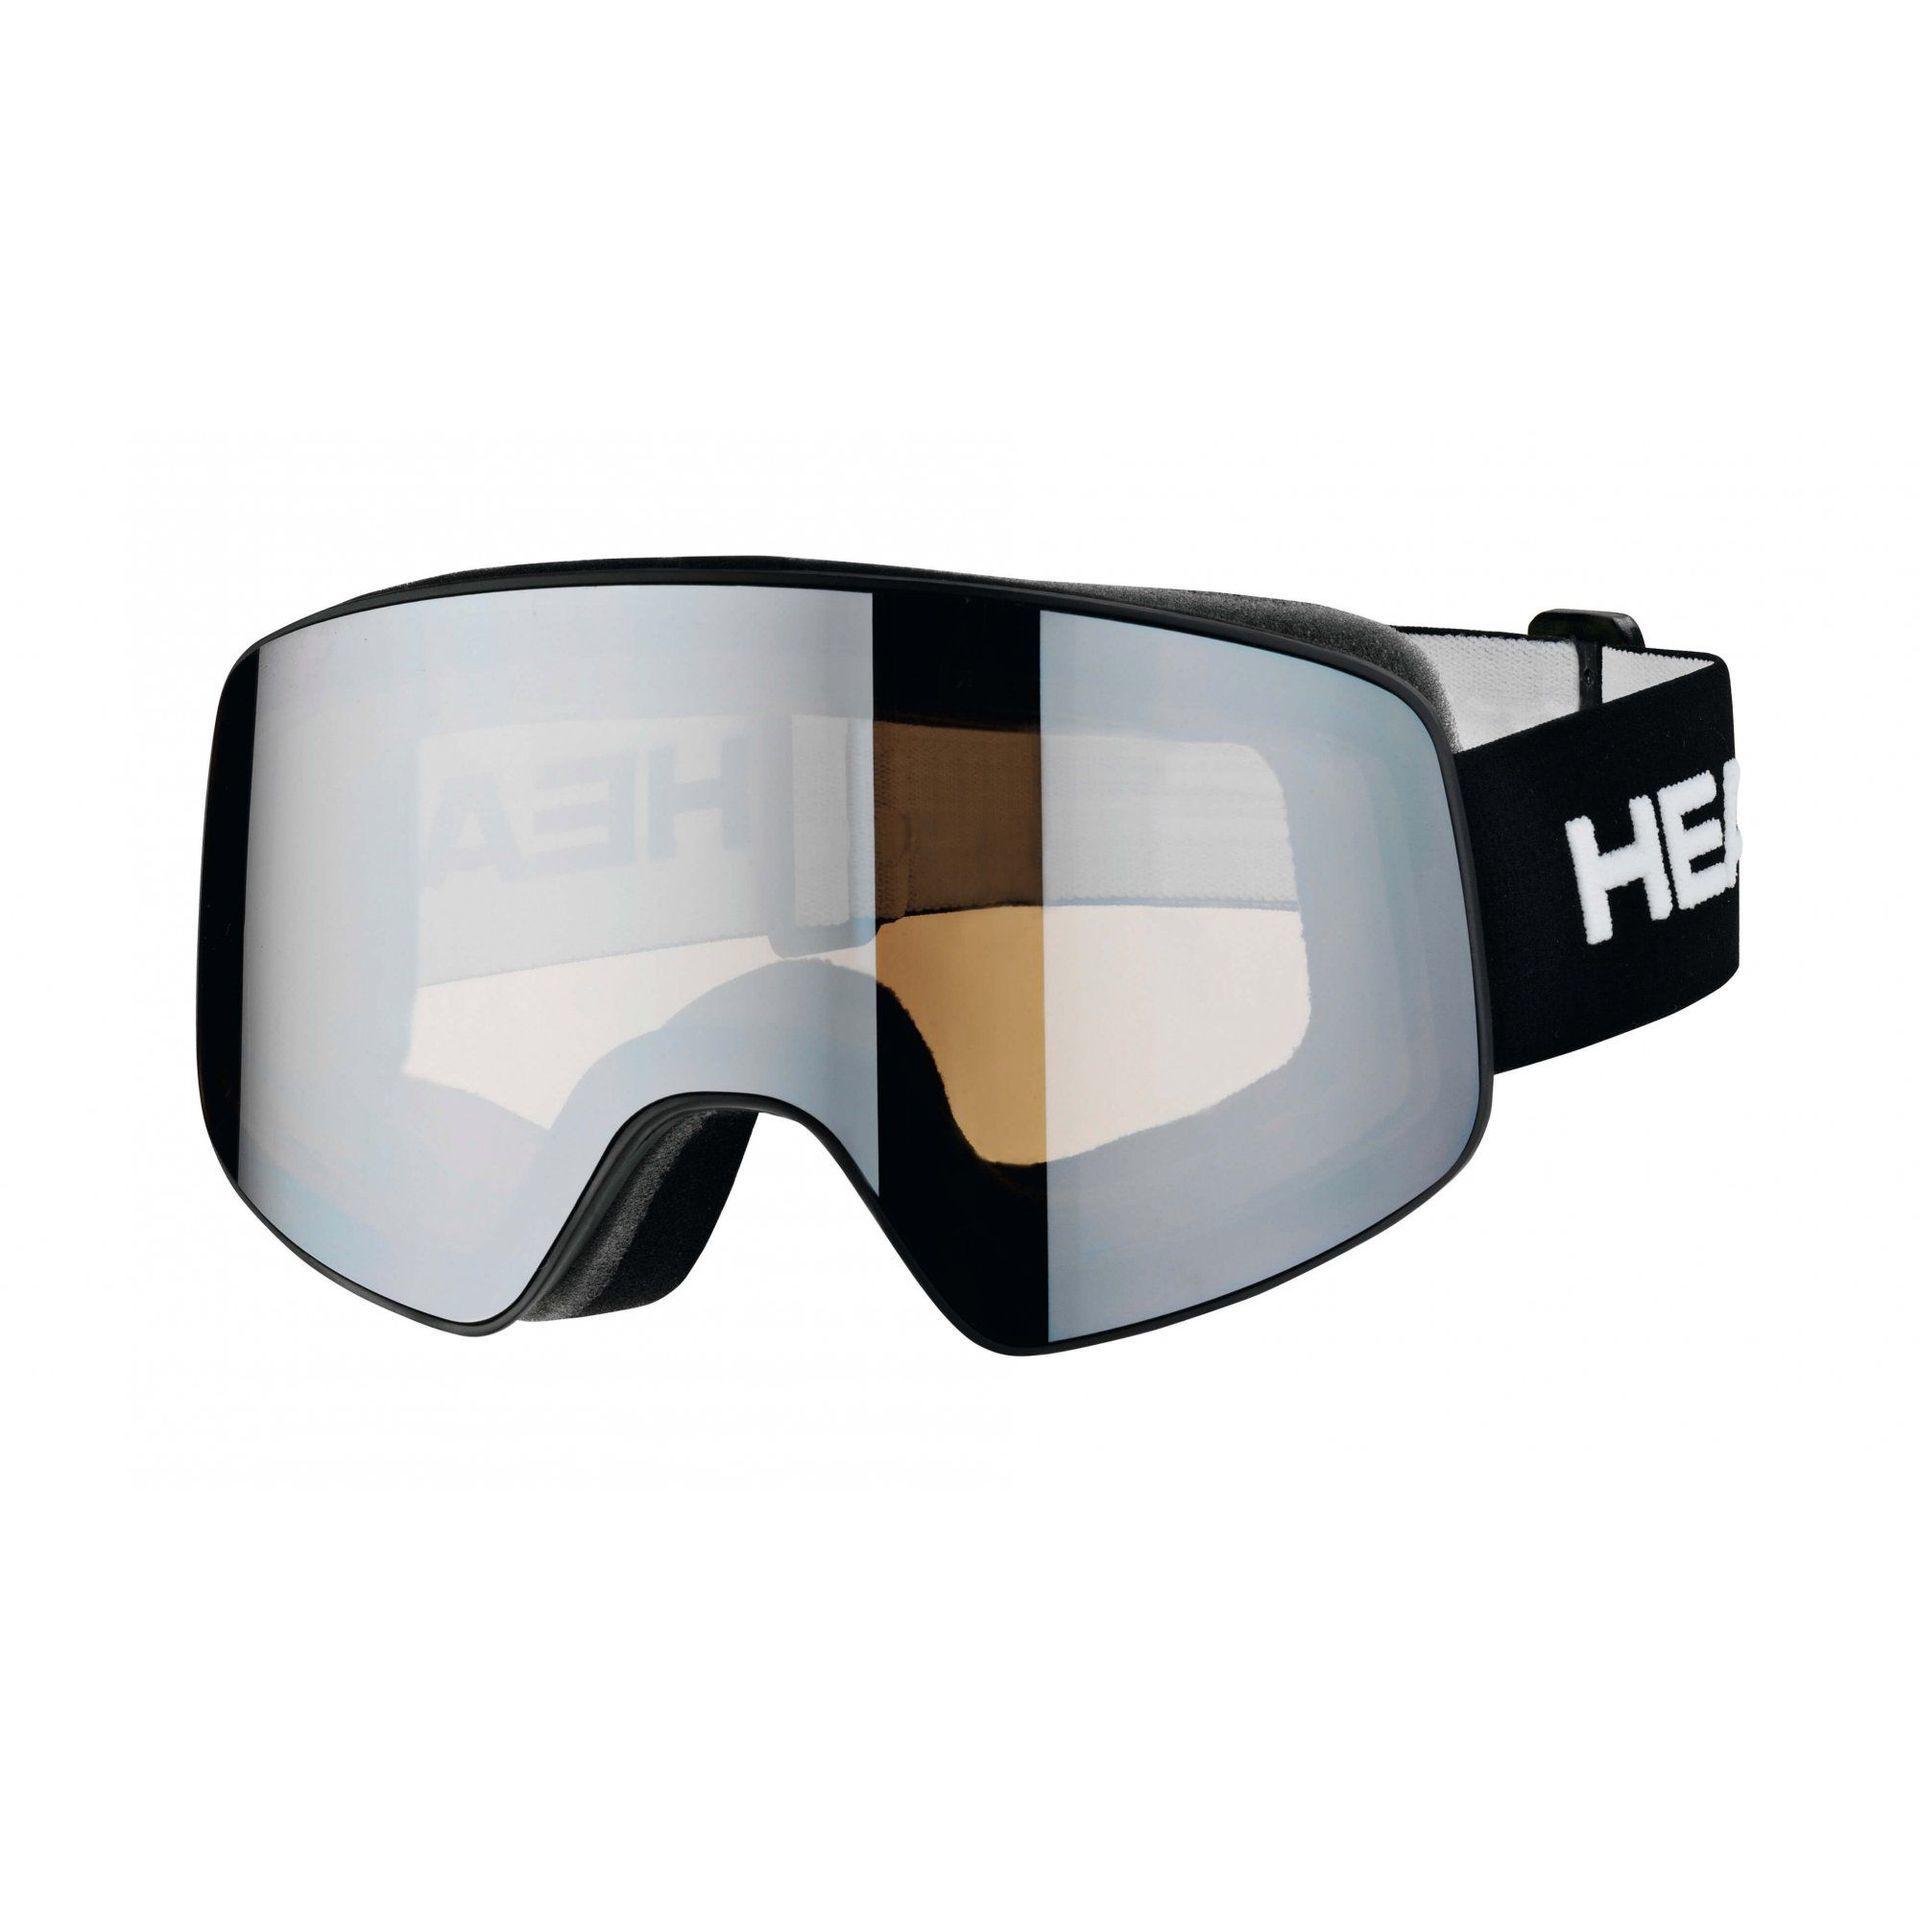 GOGLE HEAD HORIZON RACE 373314 1